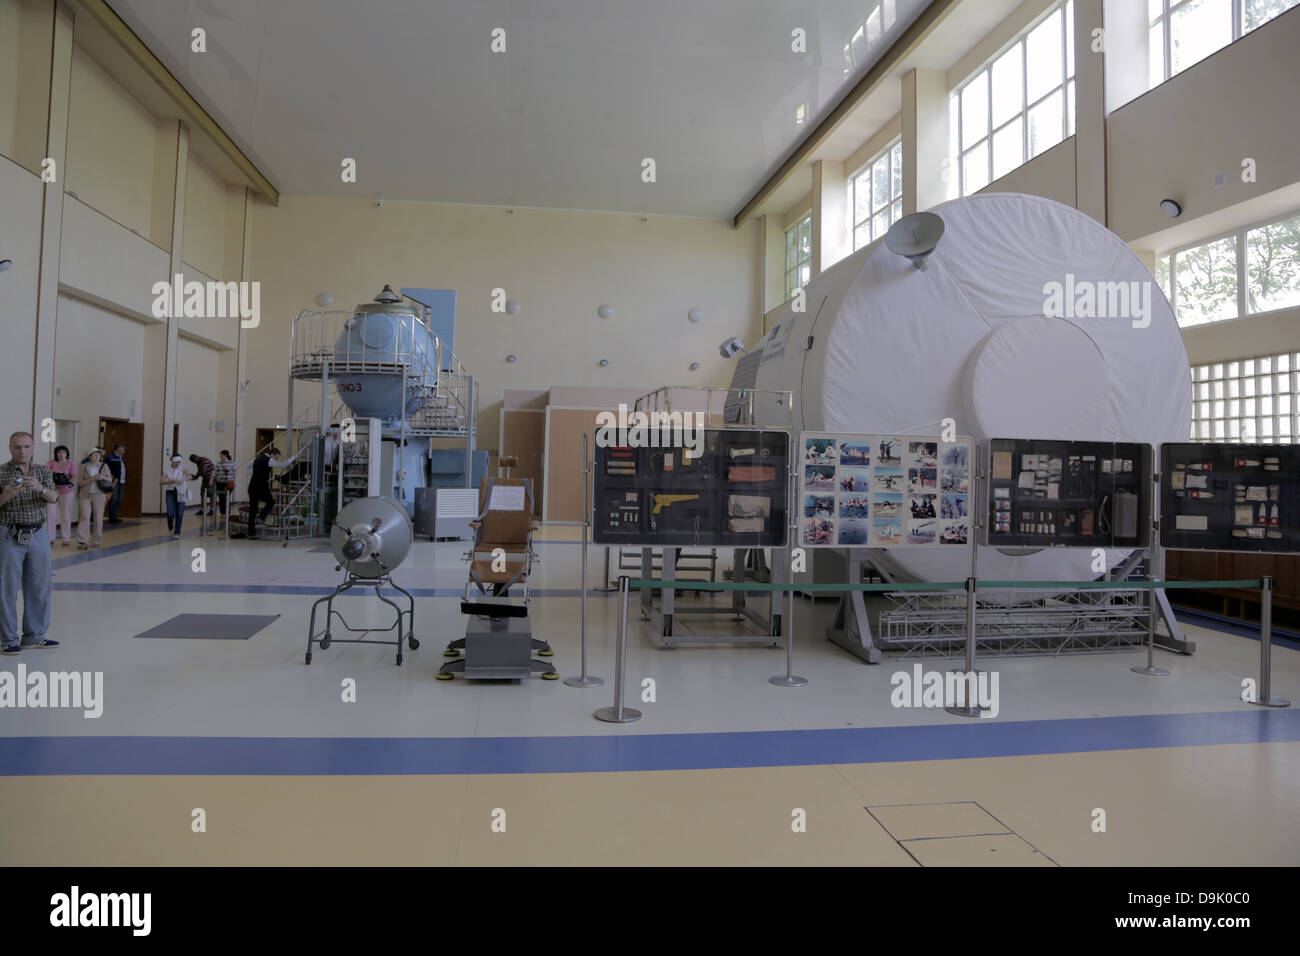 Yuri Gagarin State Scientific Research-and-Testing Cosmonaut Training Center. Moscow, Russia, Soyuz TMA, training, - Stock Image